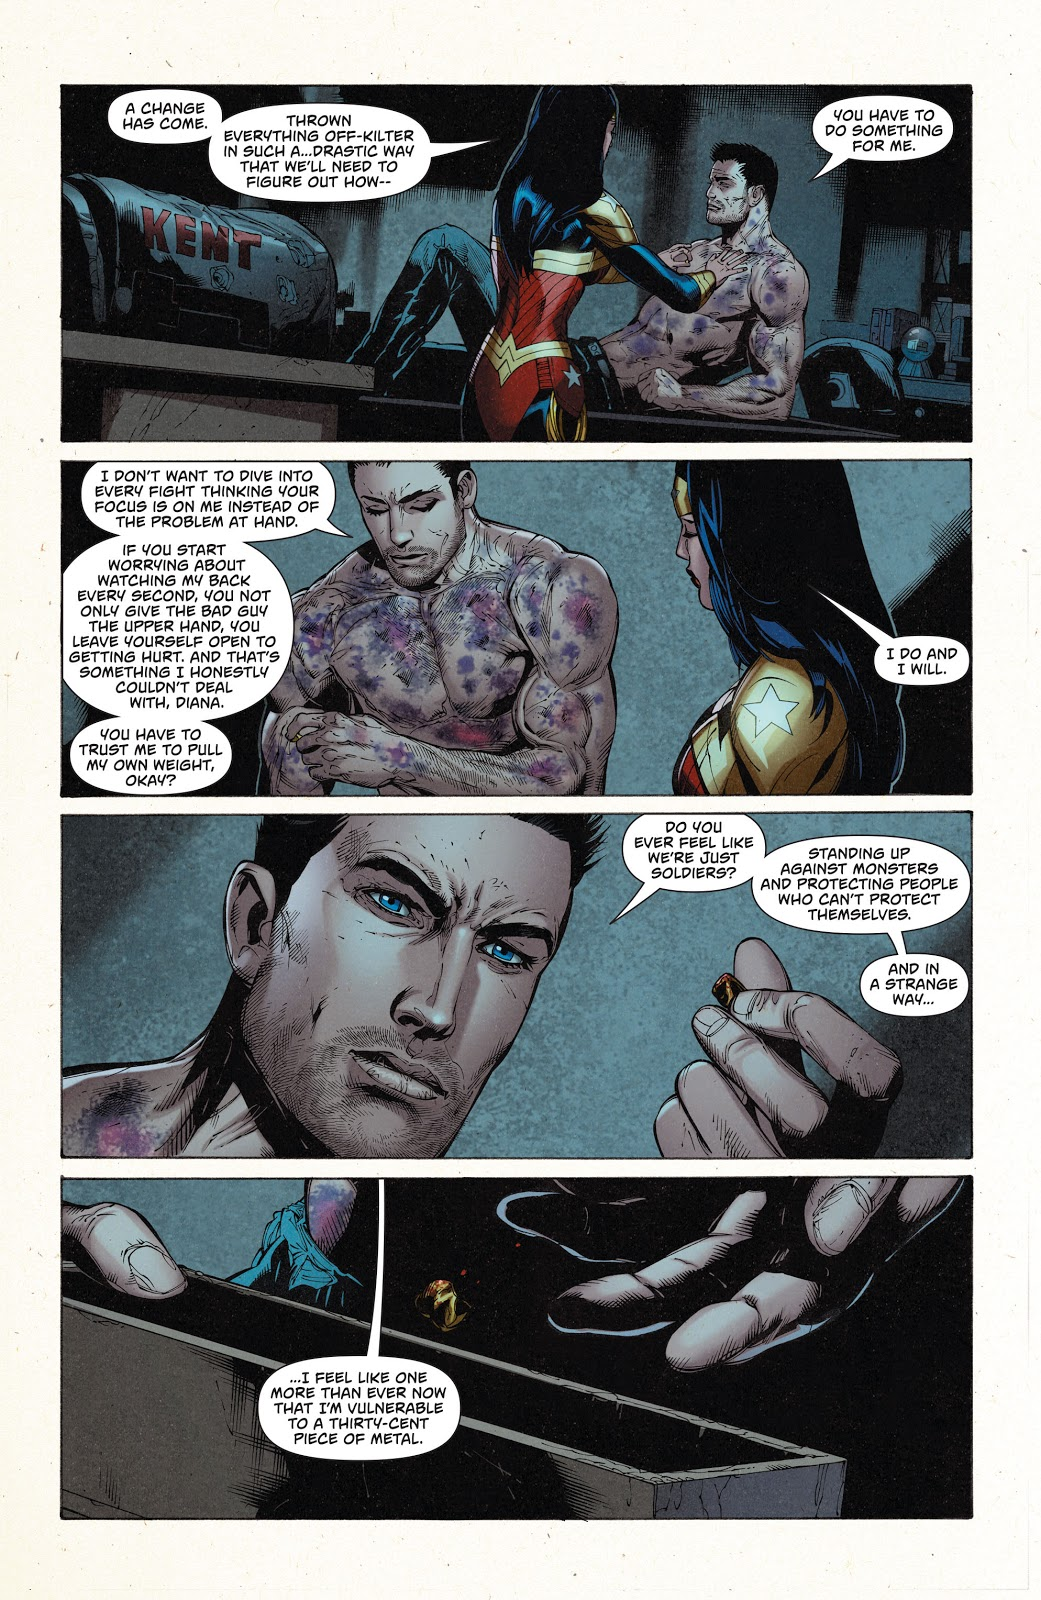 Superman Wonder Woman Dark Truth review